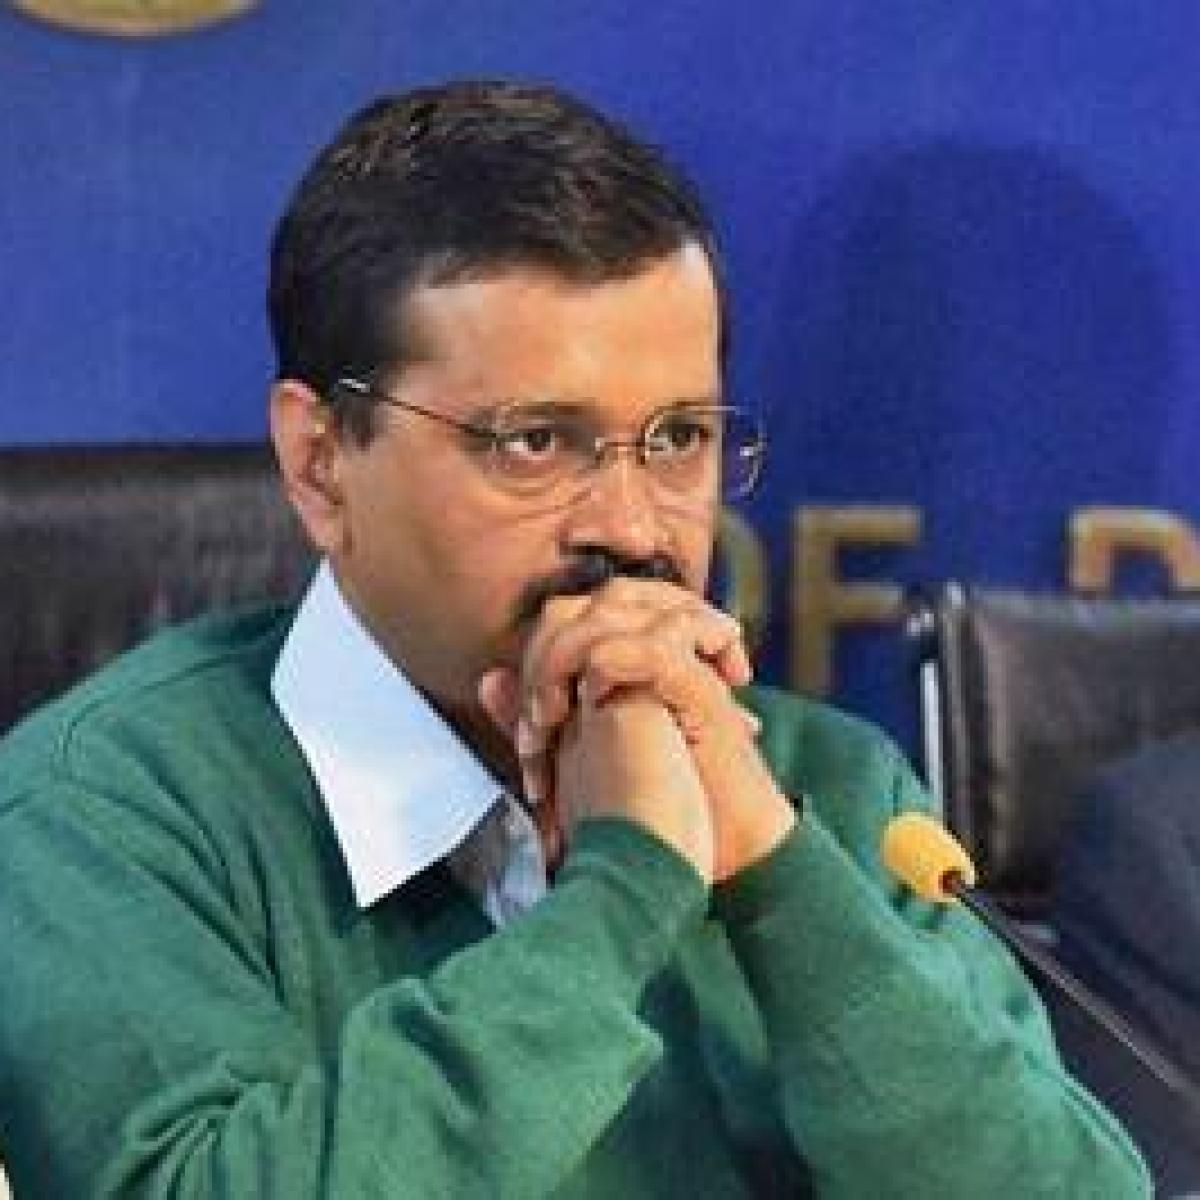 EESL urges Delhi govt to exempt electric vehicles from odd-even scheme